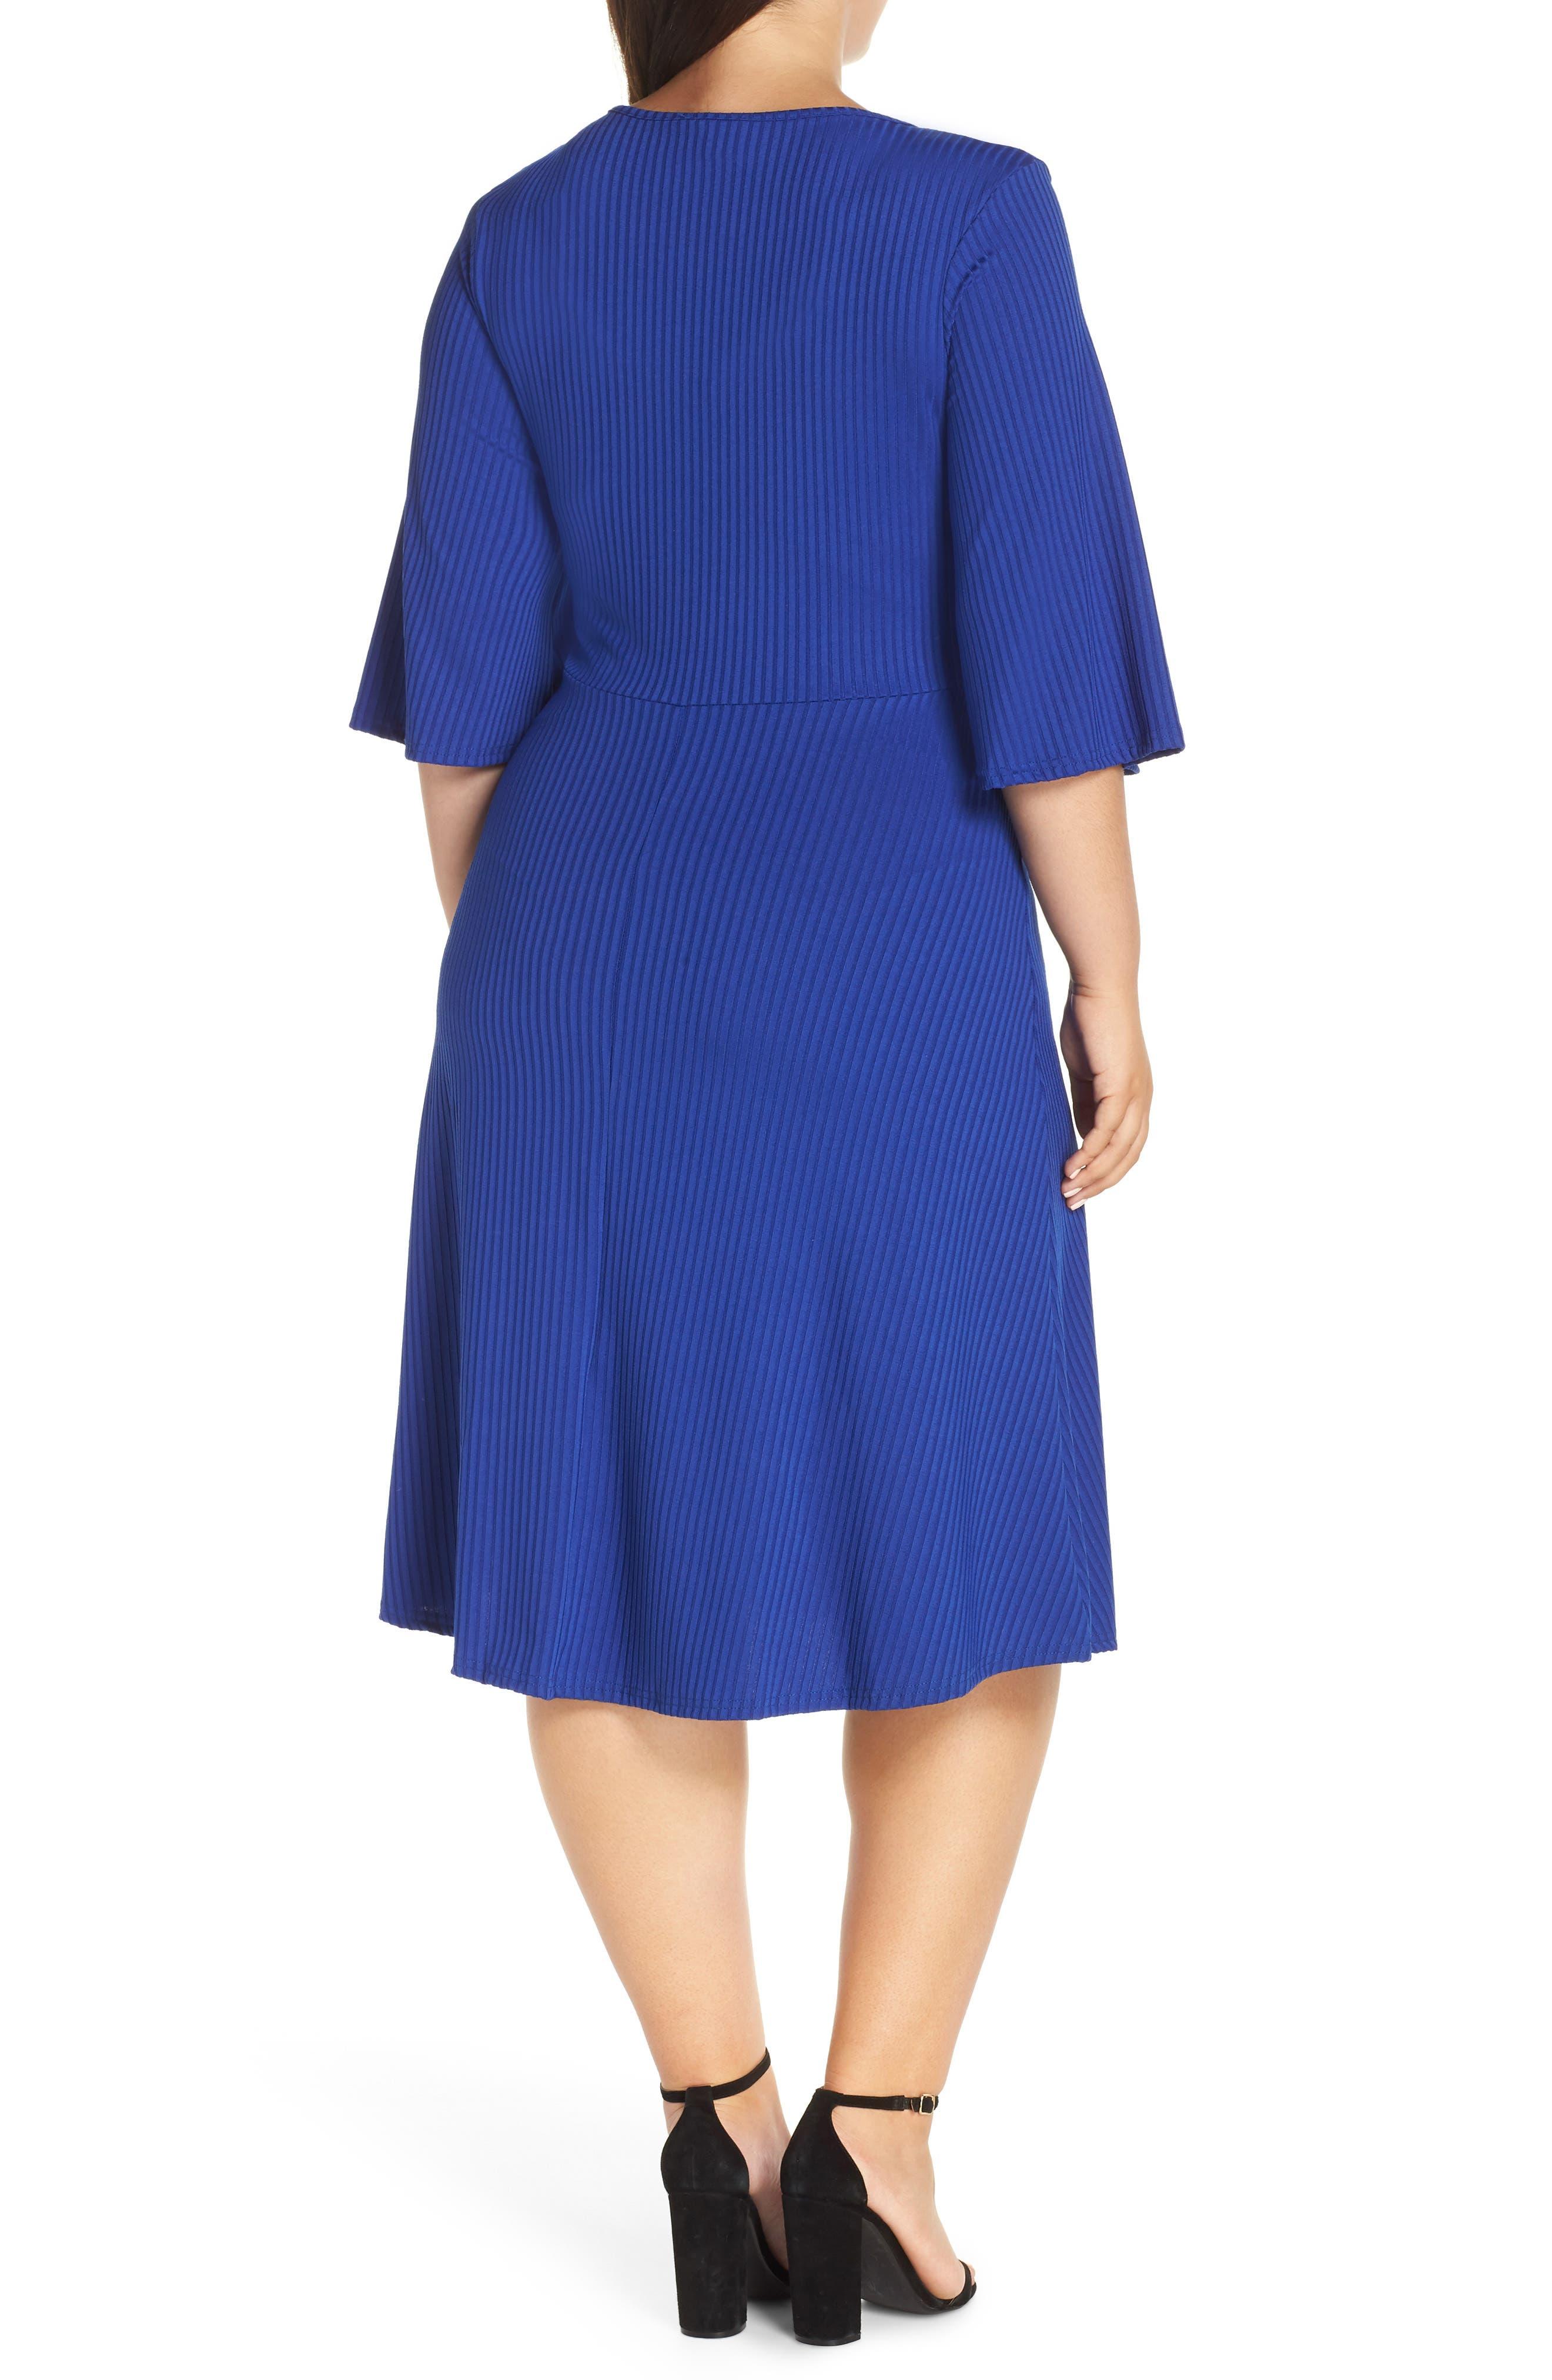 Ribbed Knit Skater Dress,                             Alternate thumbnail 2, color,                             BLUE